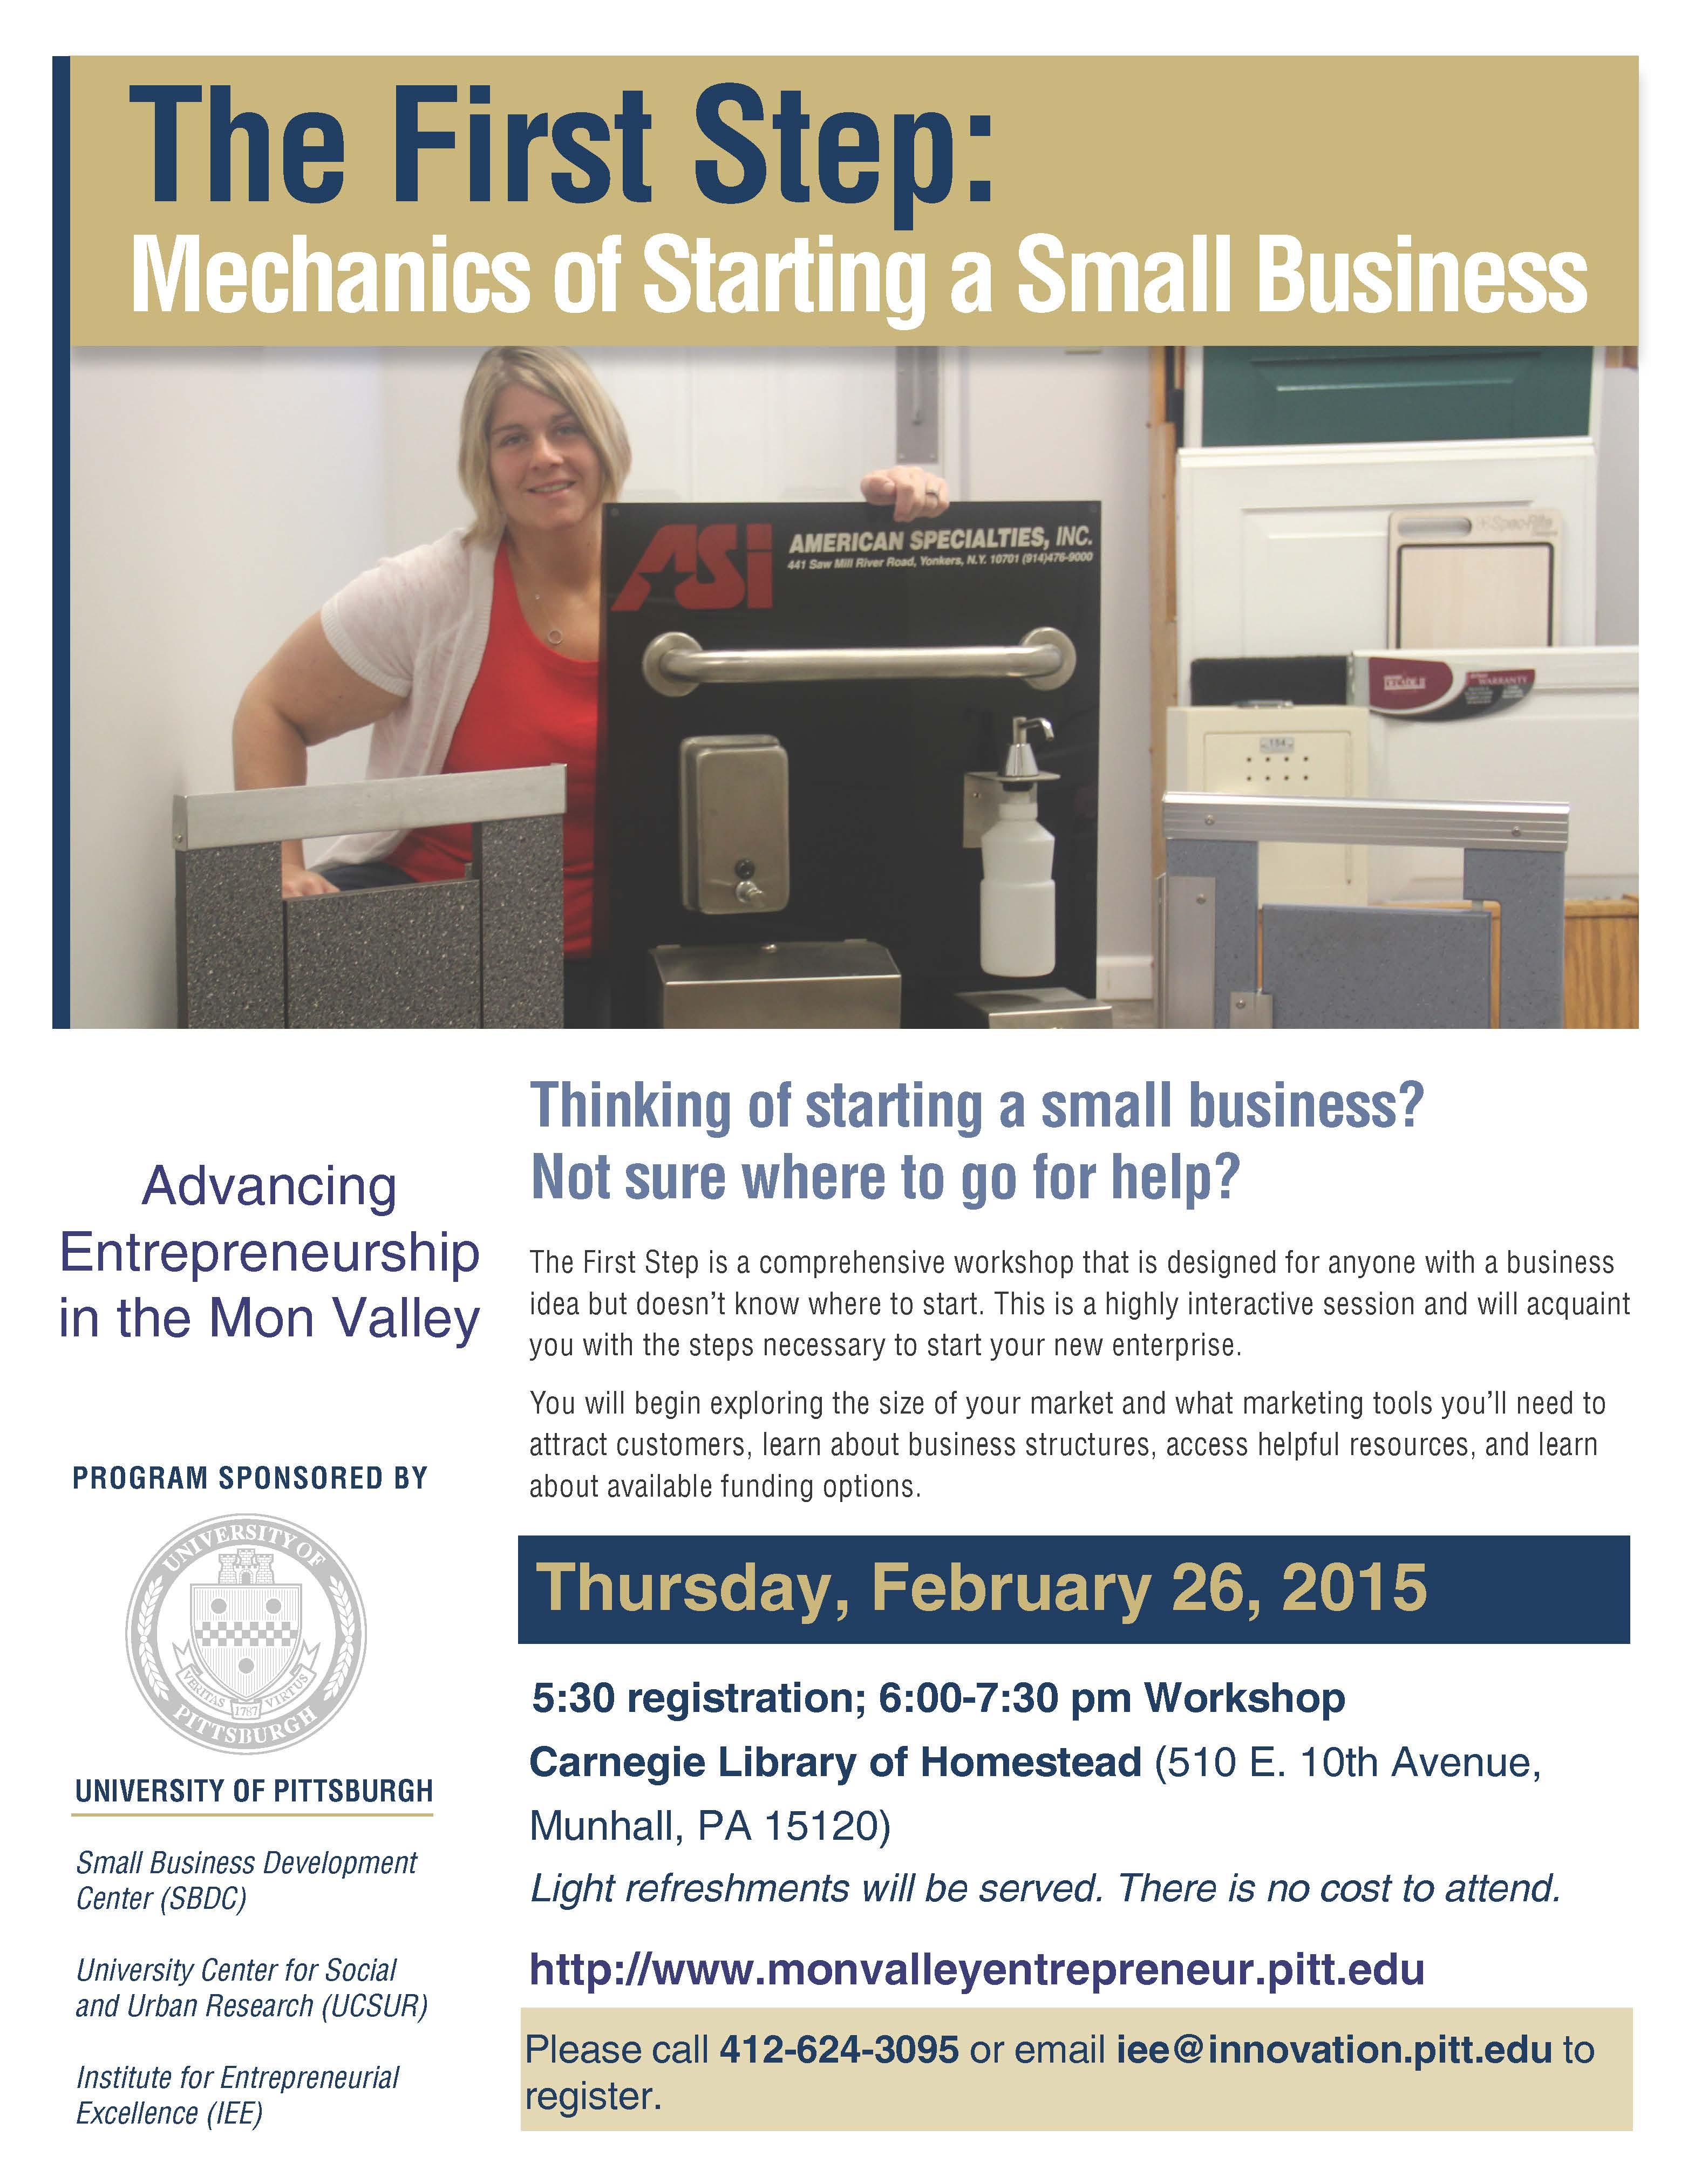 Advancing Entrepreneurship in the Mon Valley